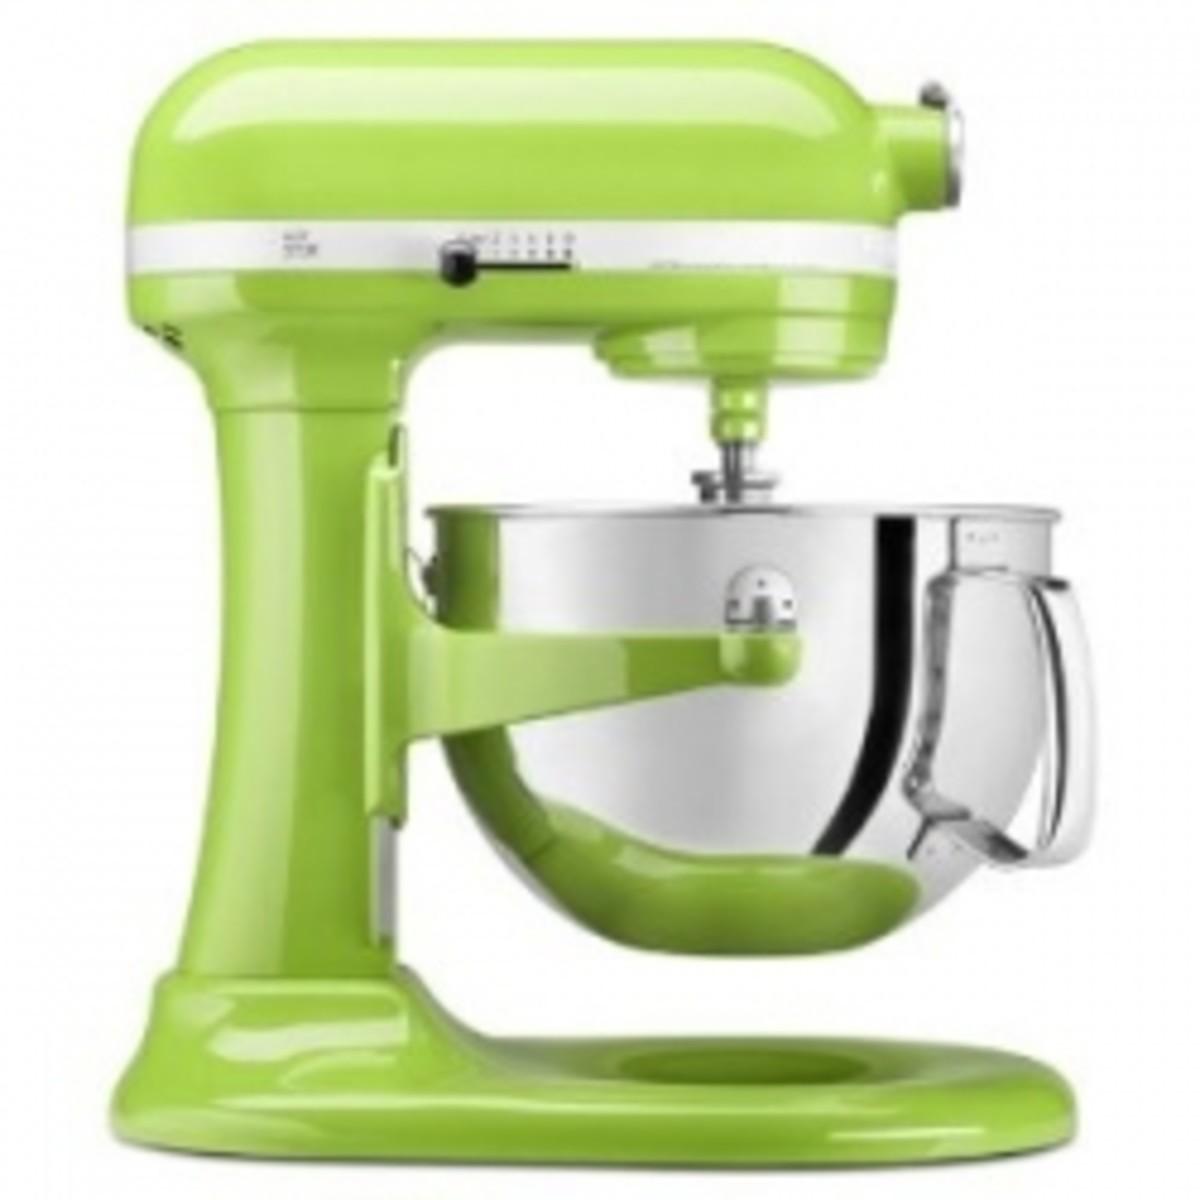 KitchenAid Pro 600 Series Stand Mixer in Green Apple